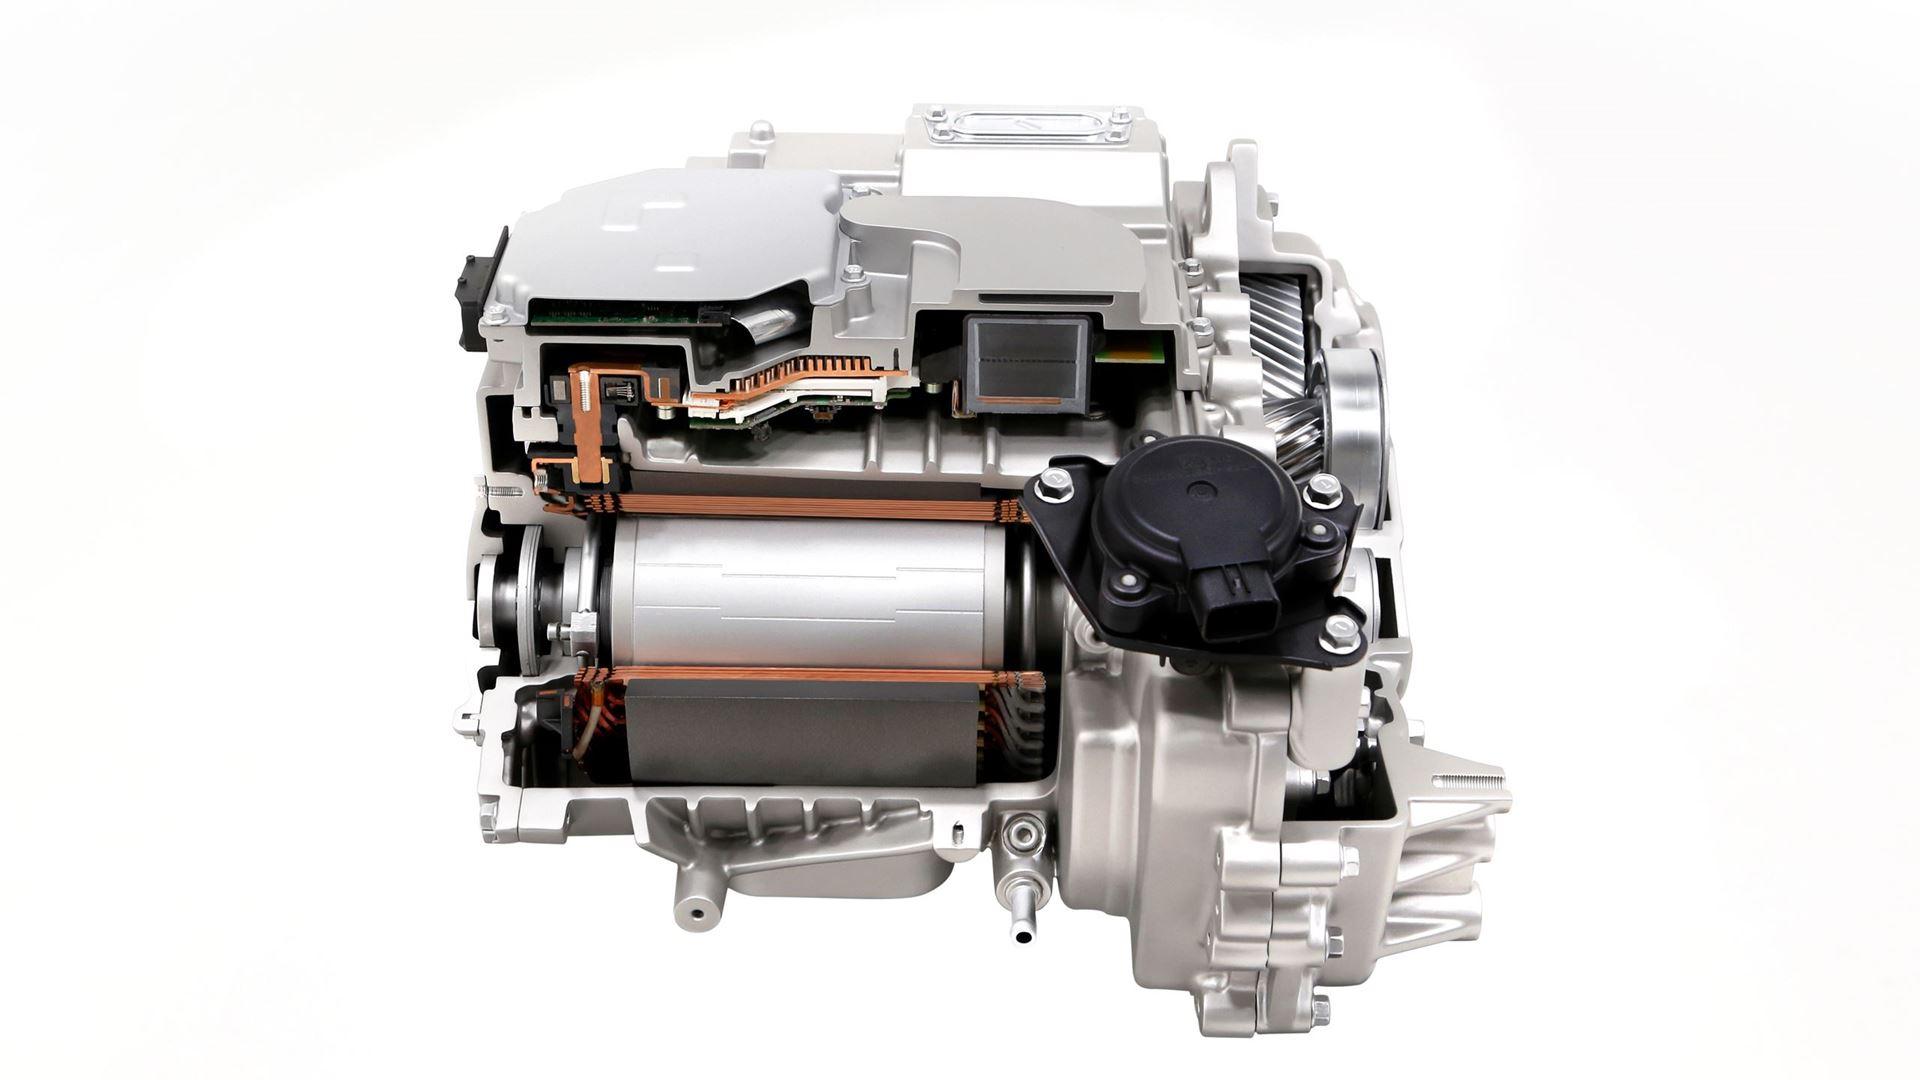 Hyundai Motor Group to Lead Charge into Electric Era with Dedicated EV Platform 'E-GMP' - Image 2